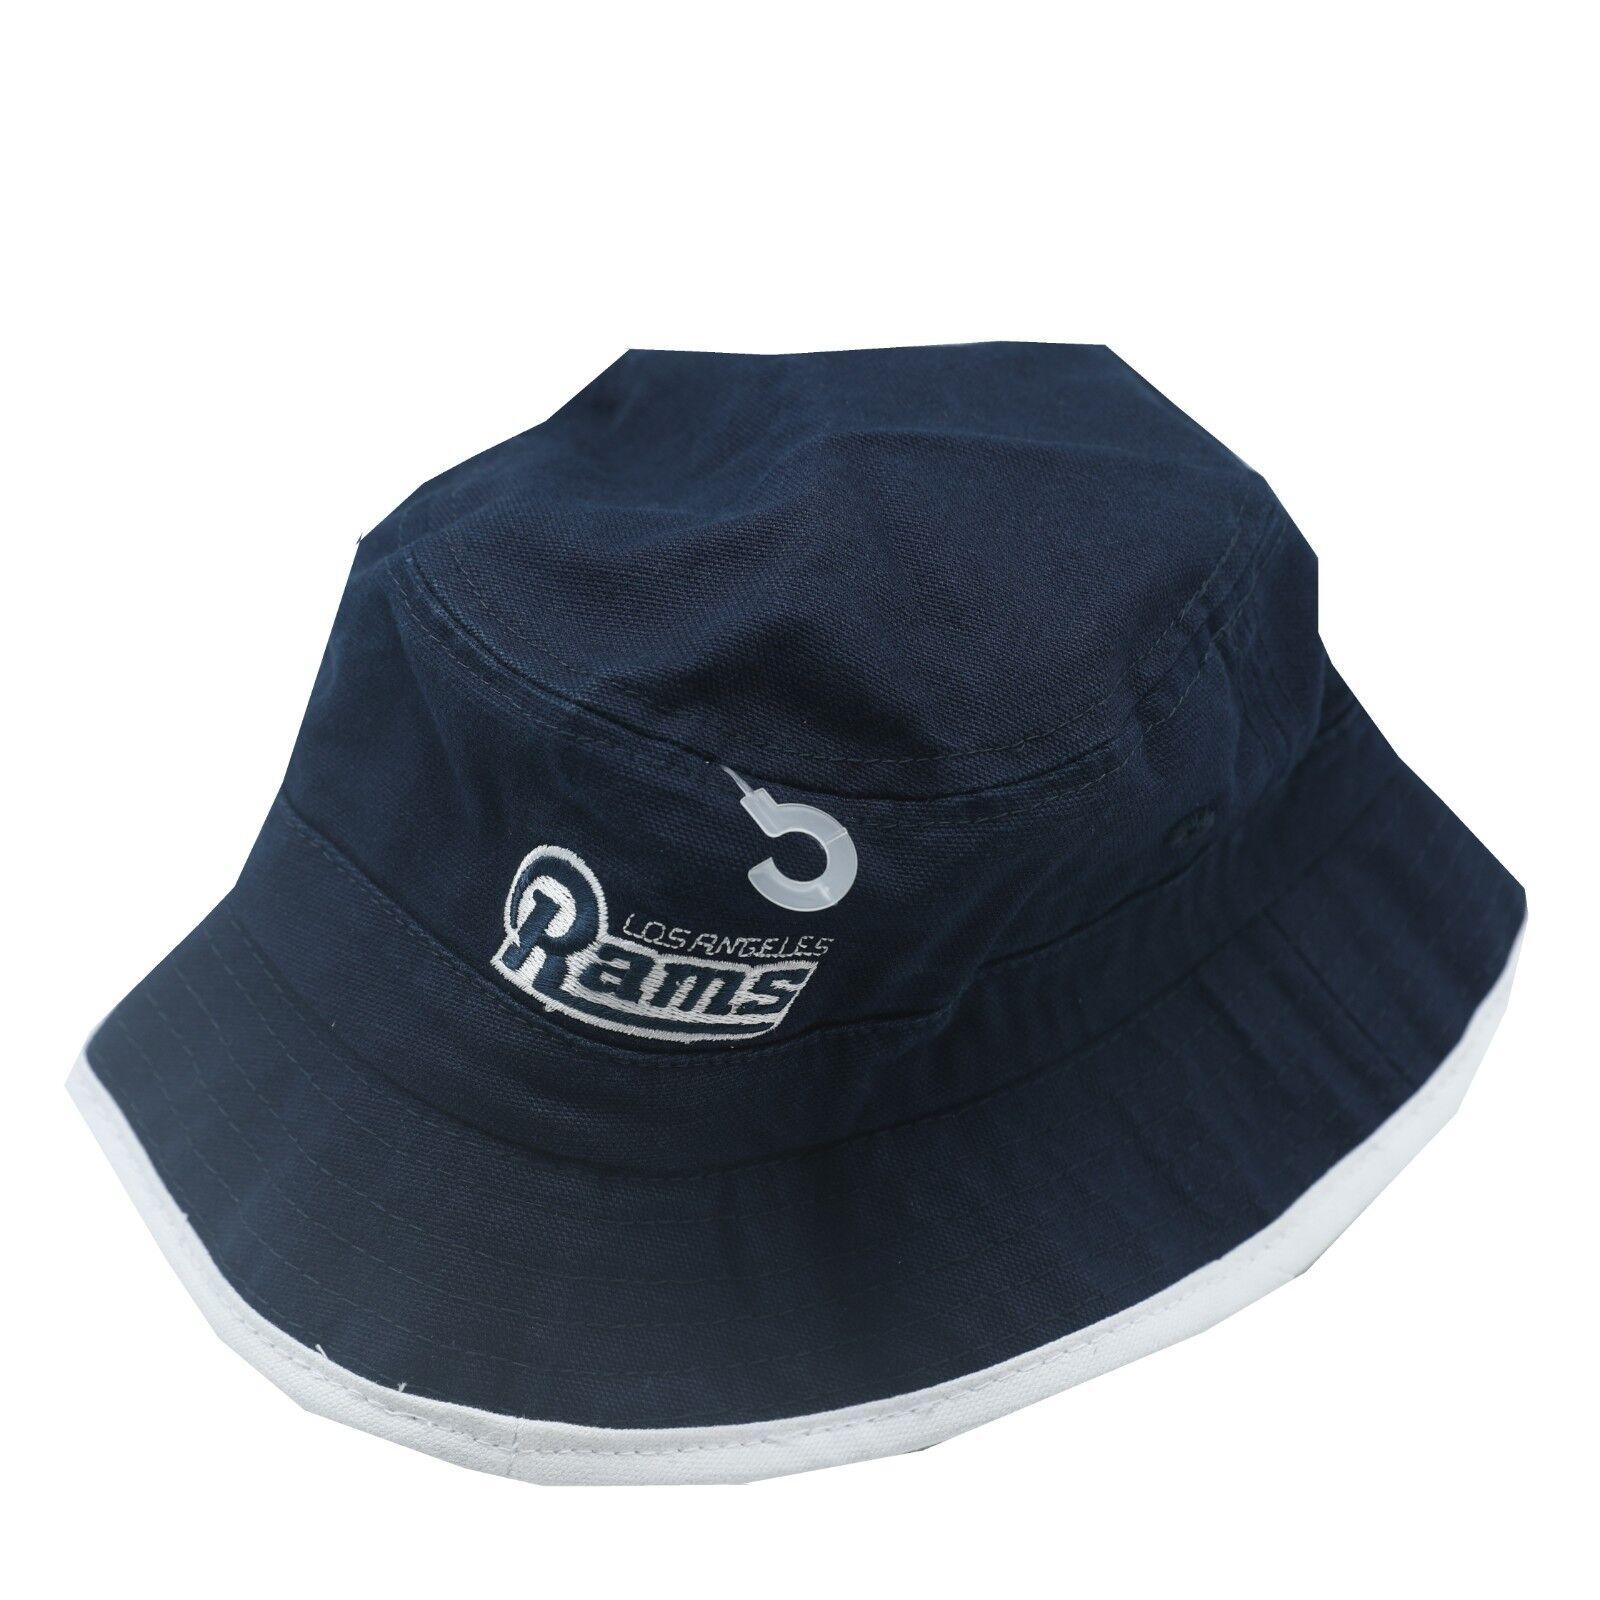 5a04de602 Los Angeles Rams NFL Kids Youth Boys (4-7) OSFM Fisherman s Hat Cap ...